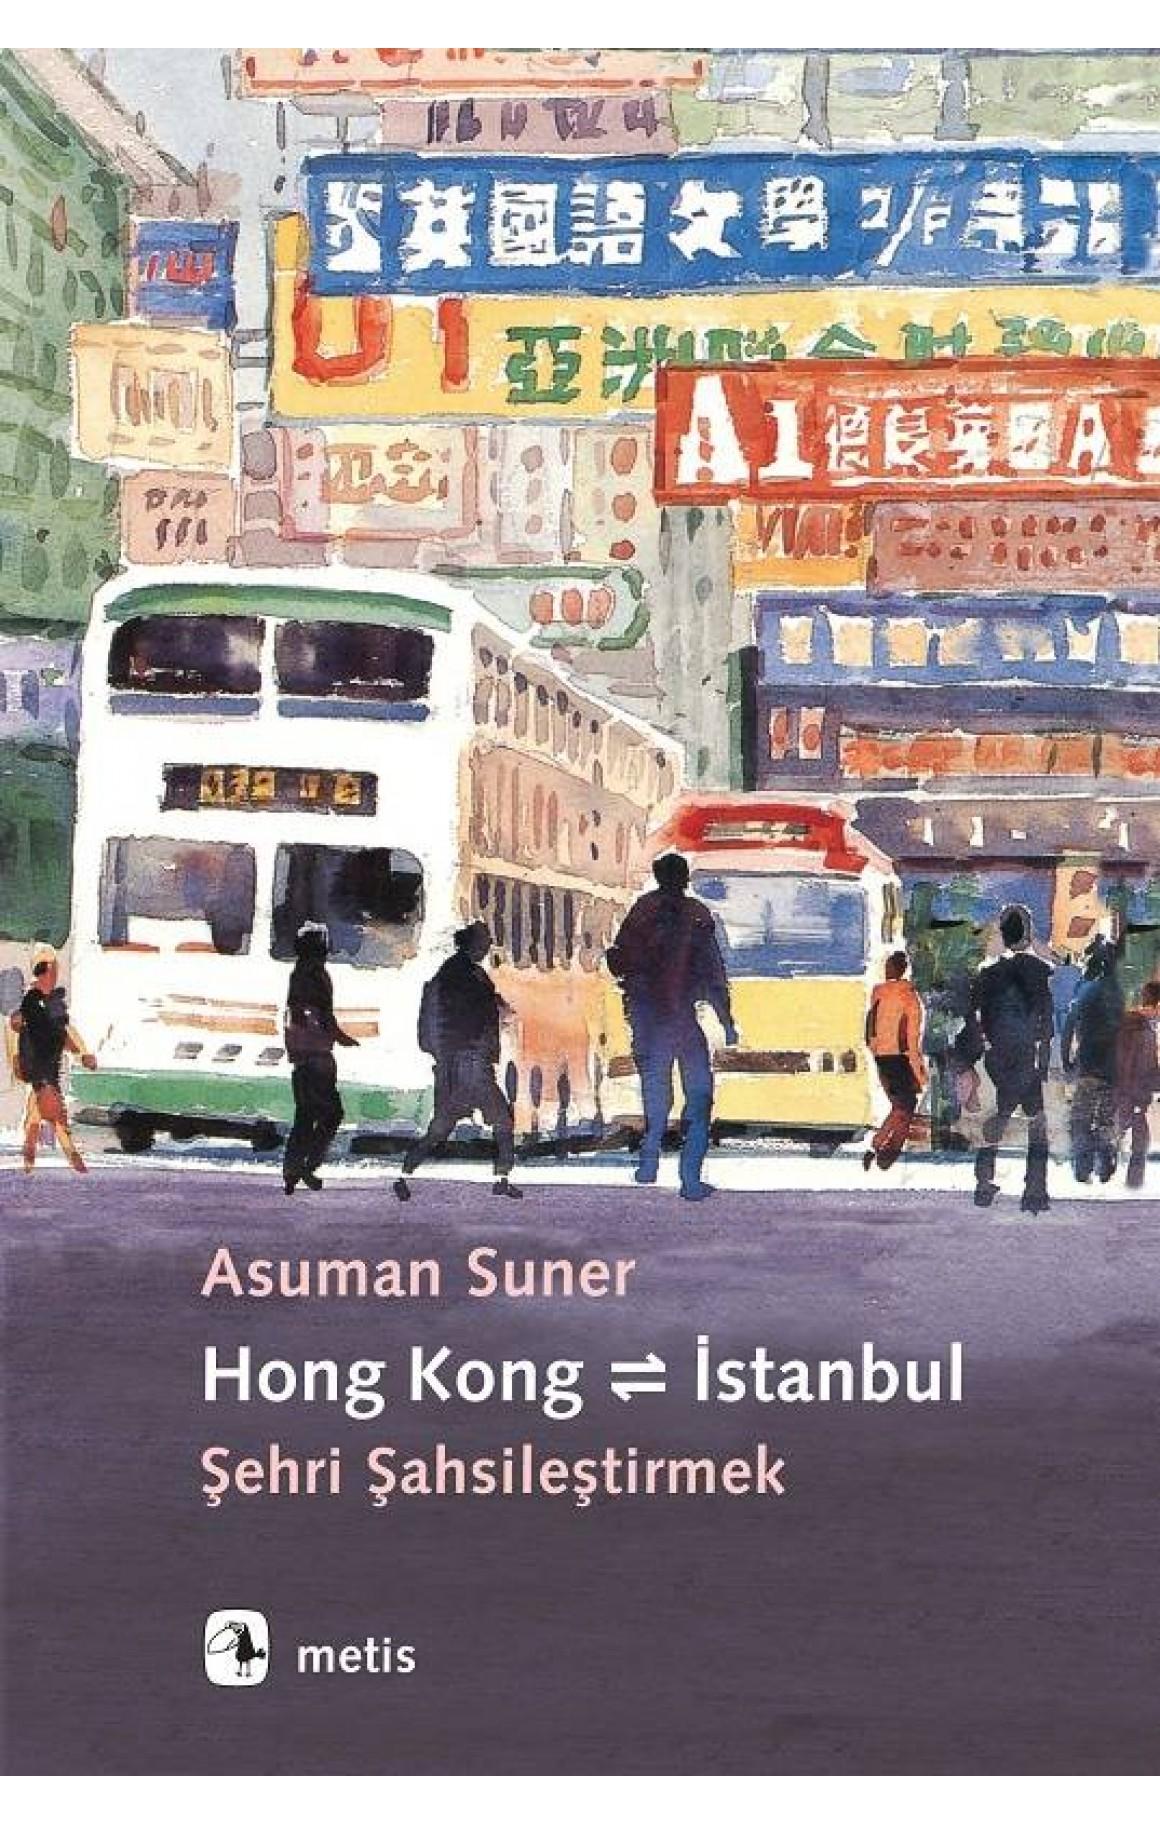 Hong Kong-İstanbul-Şehri Şahsileştirmek